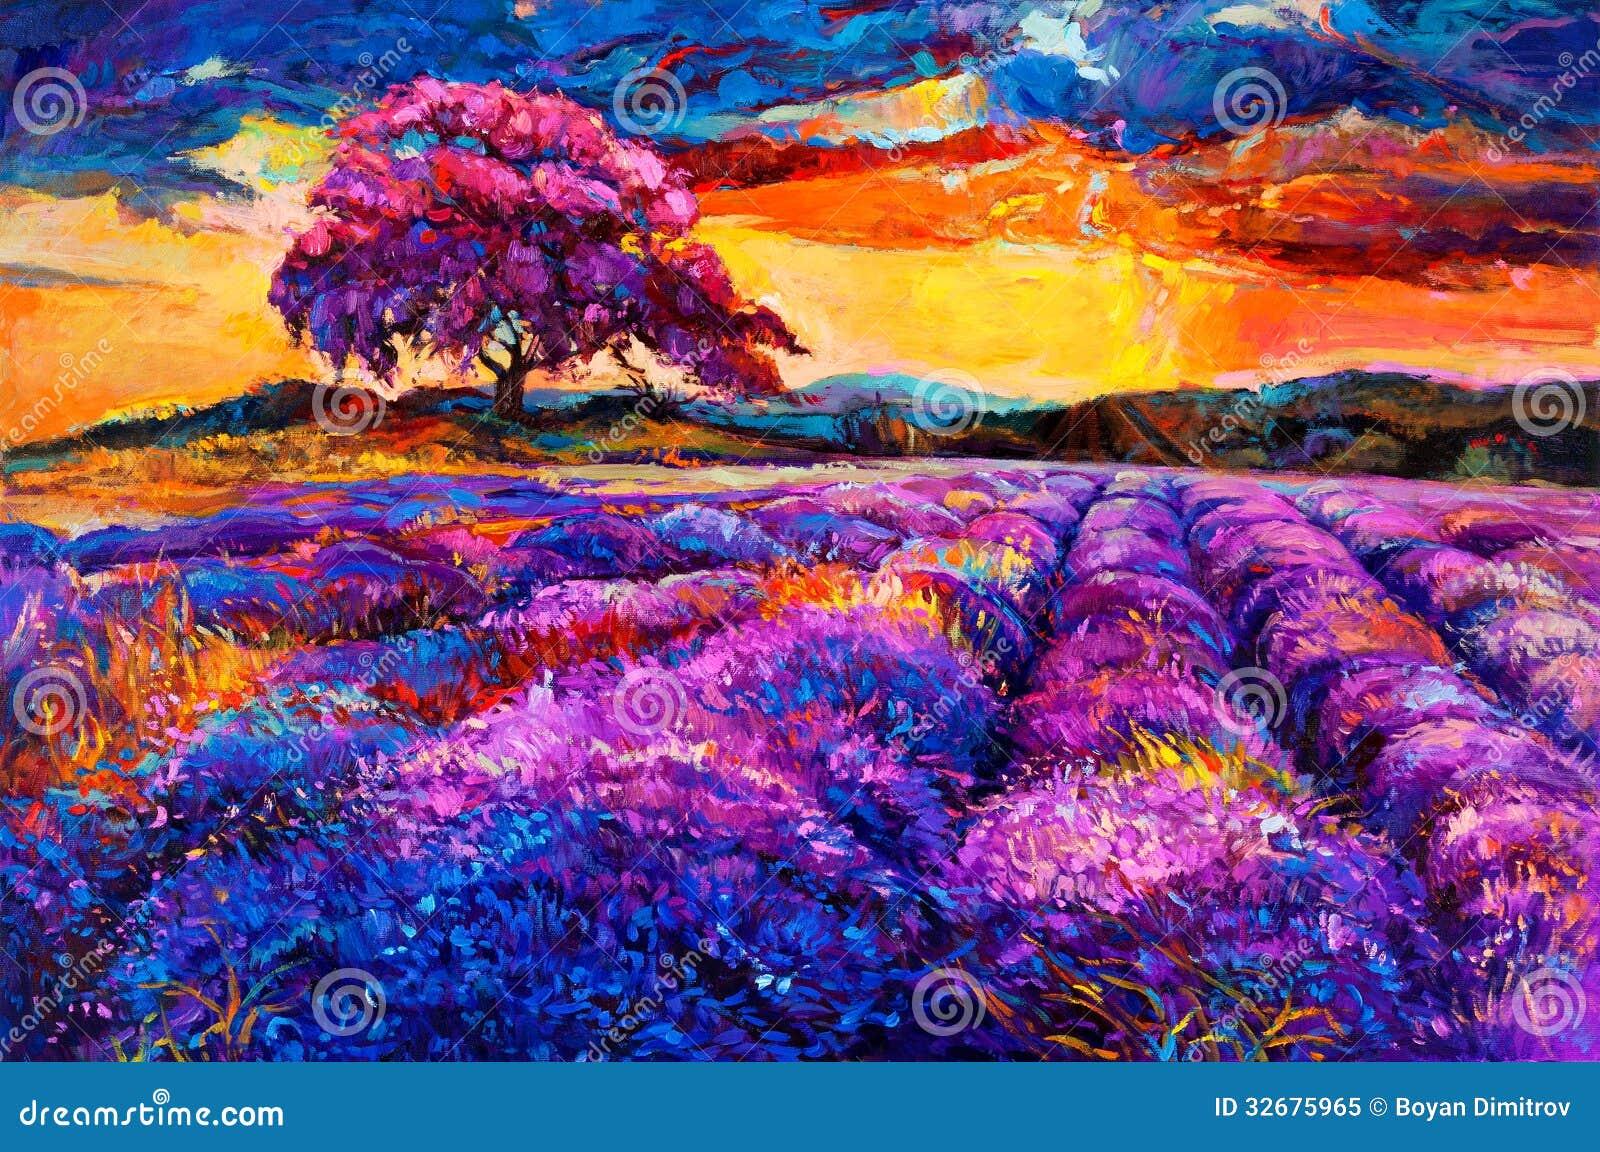 Scotland art buy original oil paintings online leading for Selling oil paintings online